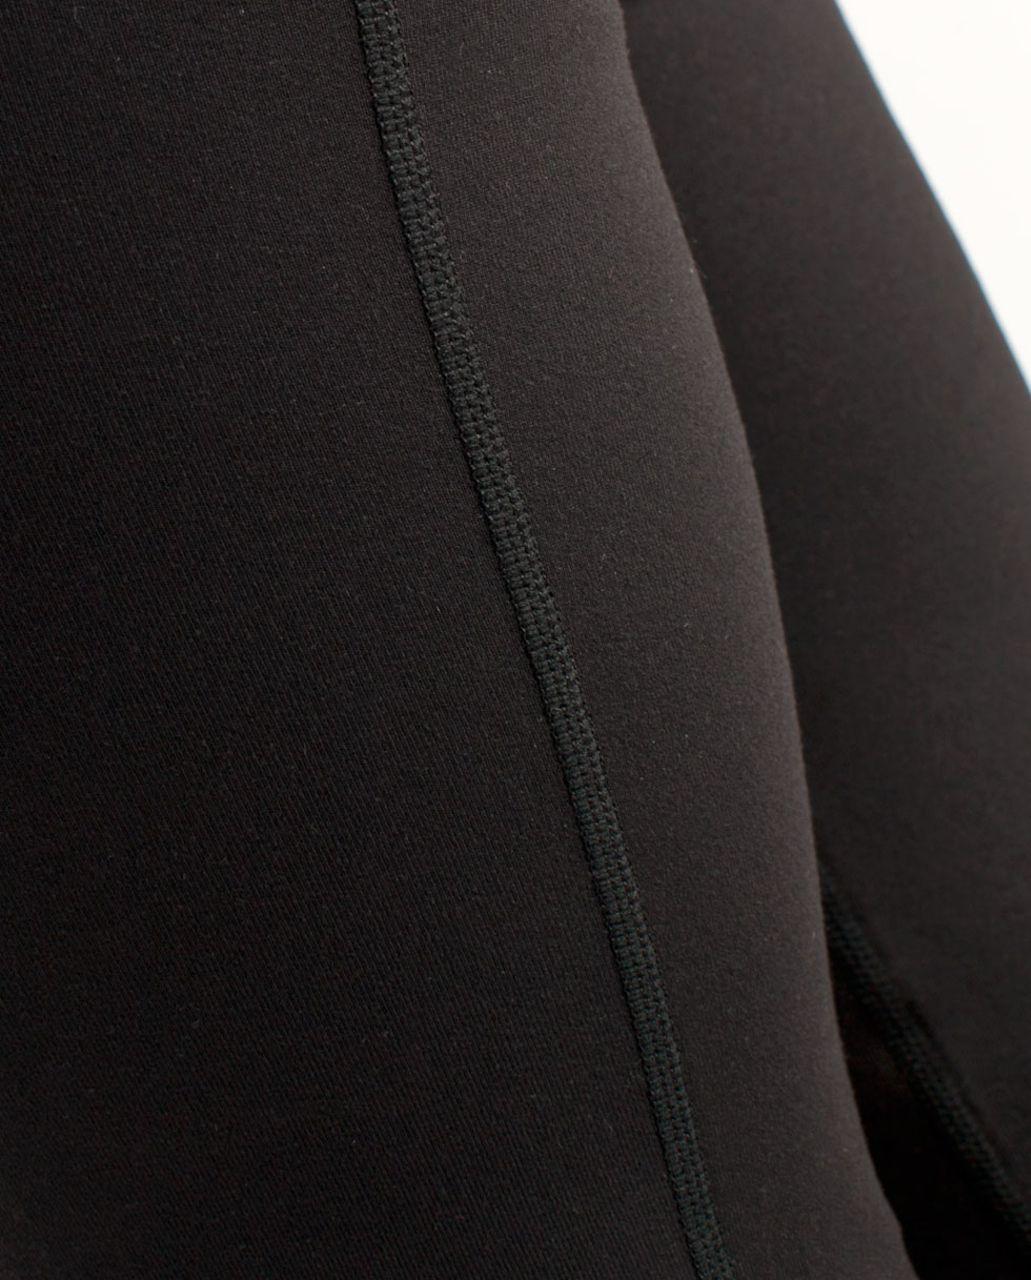 Lululemon Groove Crop - Black /  White Black Glacier Lace /  White Black Glacier Lace